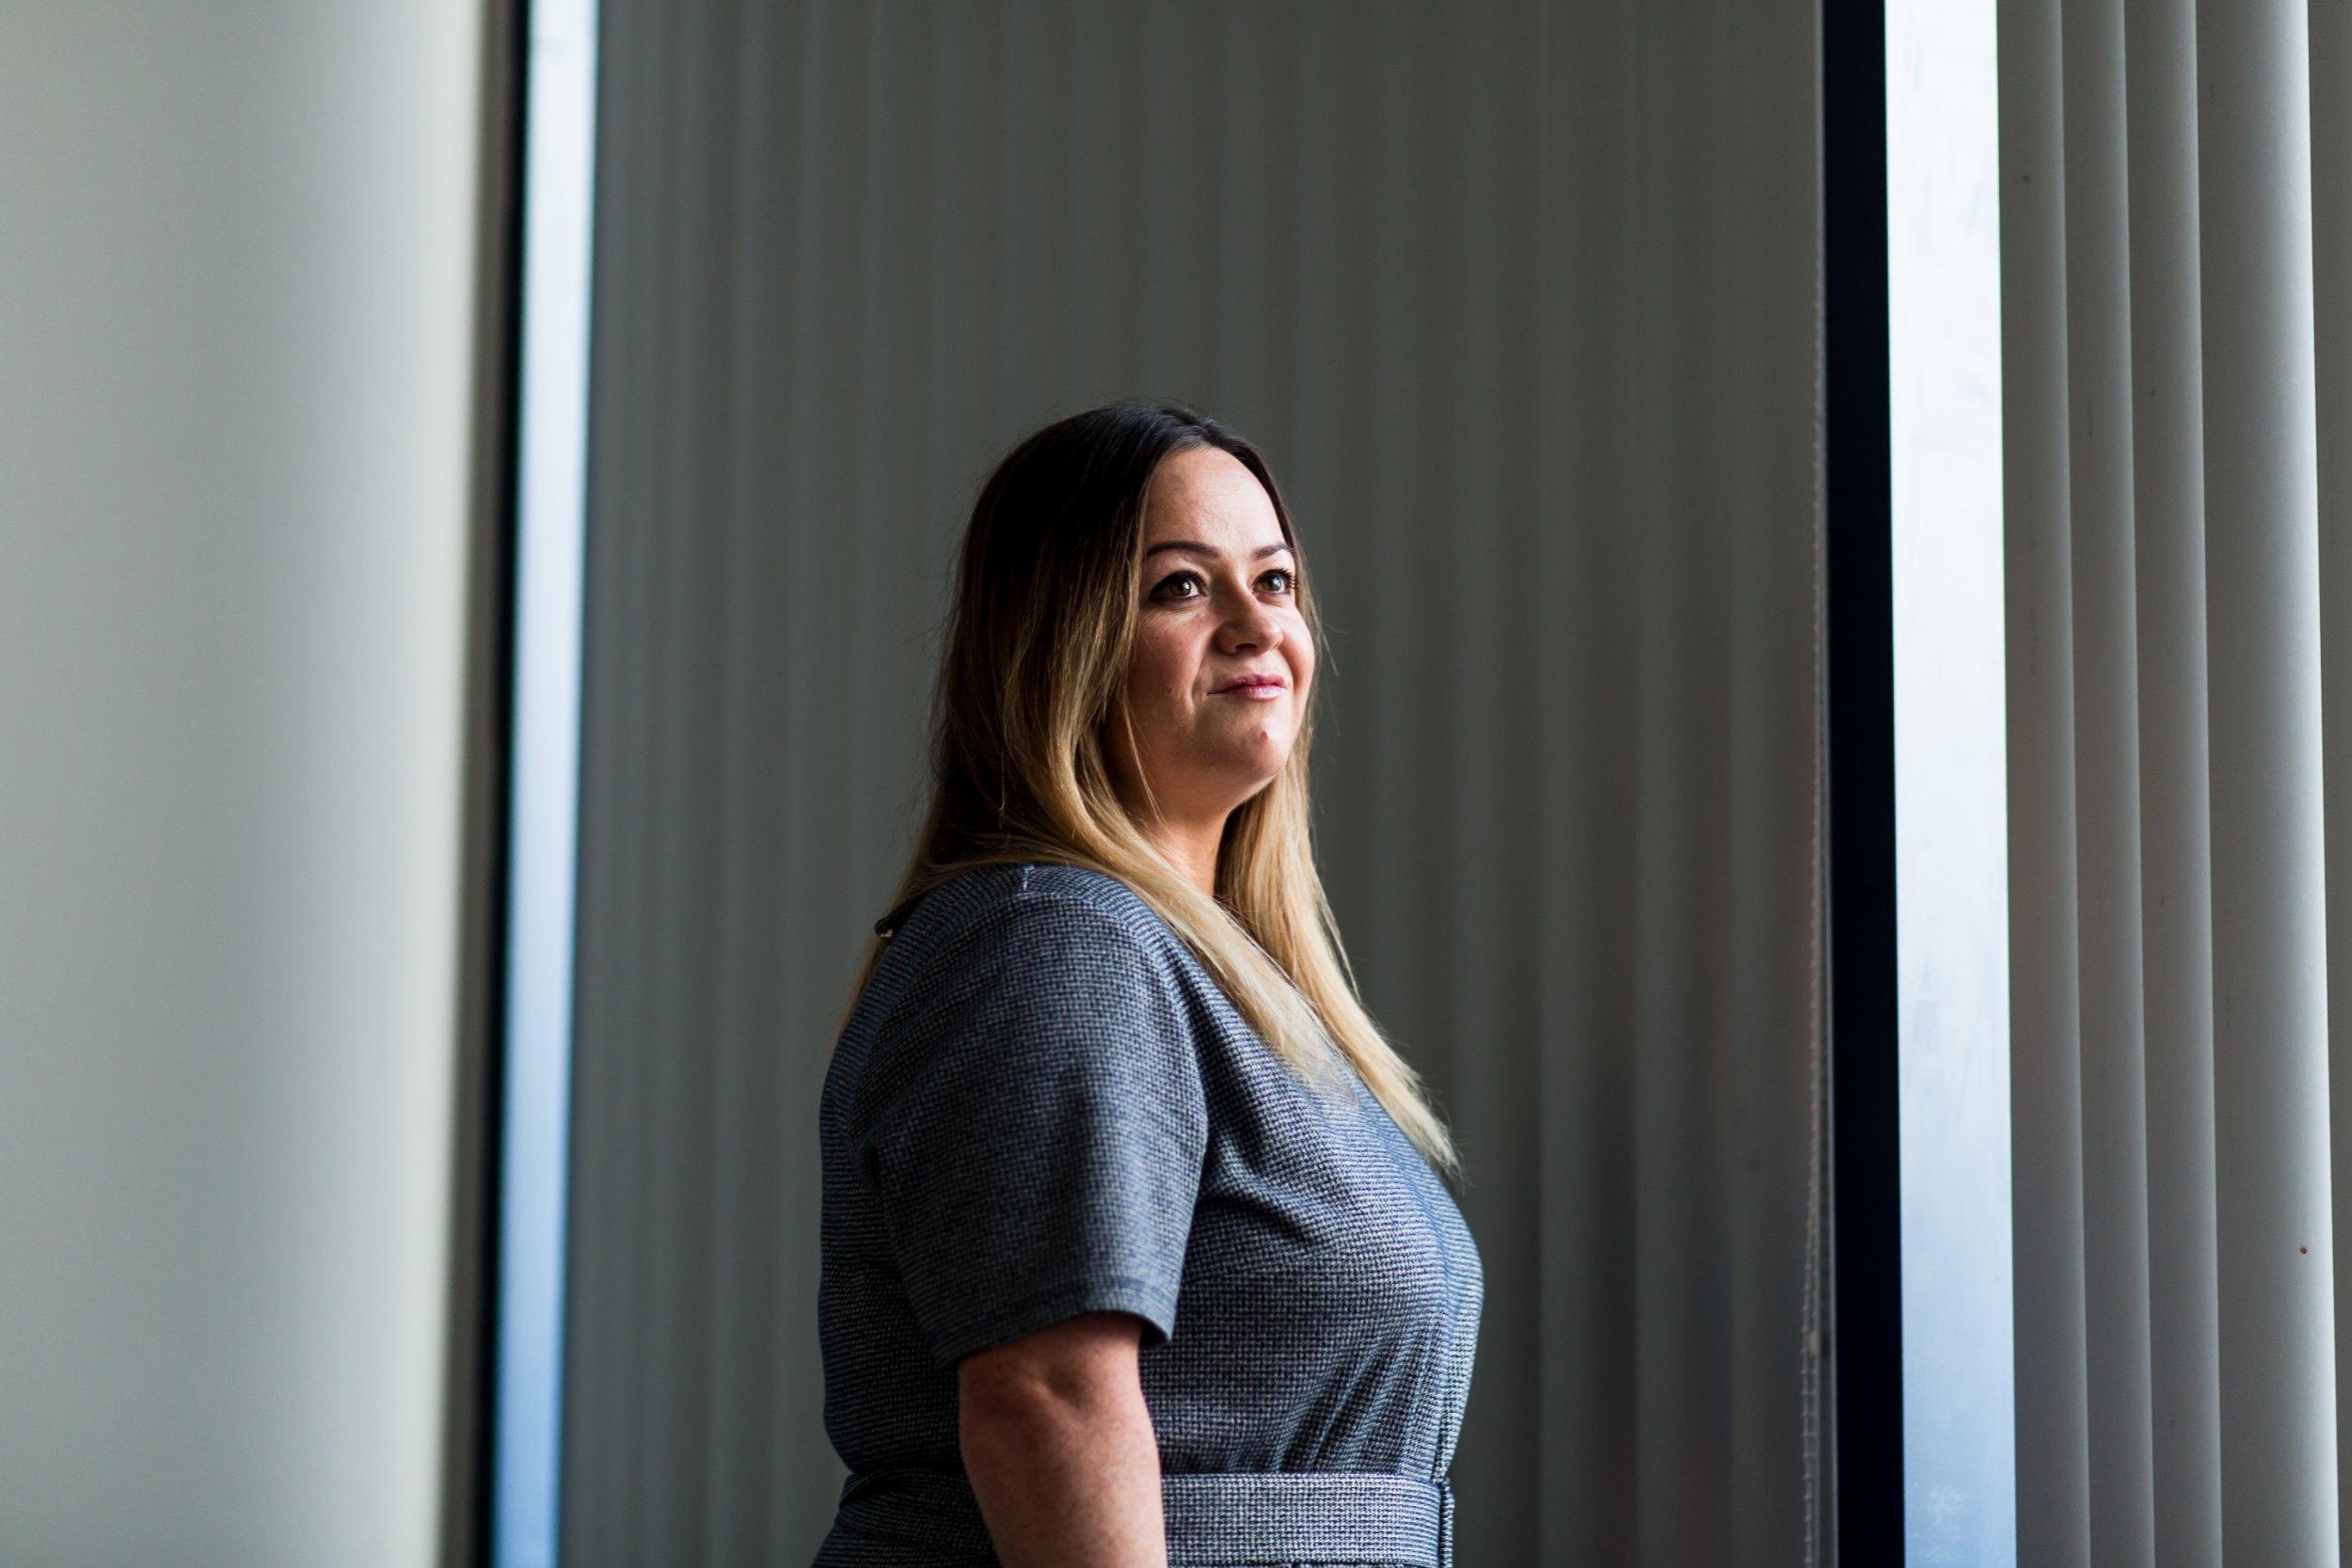 Jacqueline Quinn - LGBT role model for Metro.co.uk